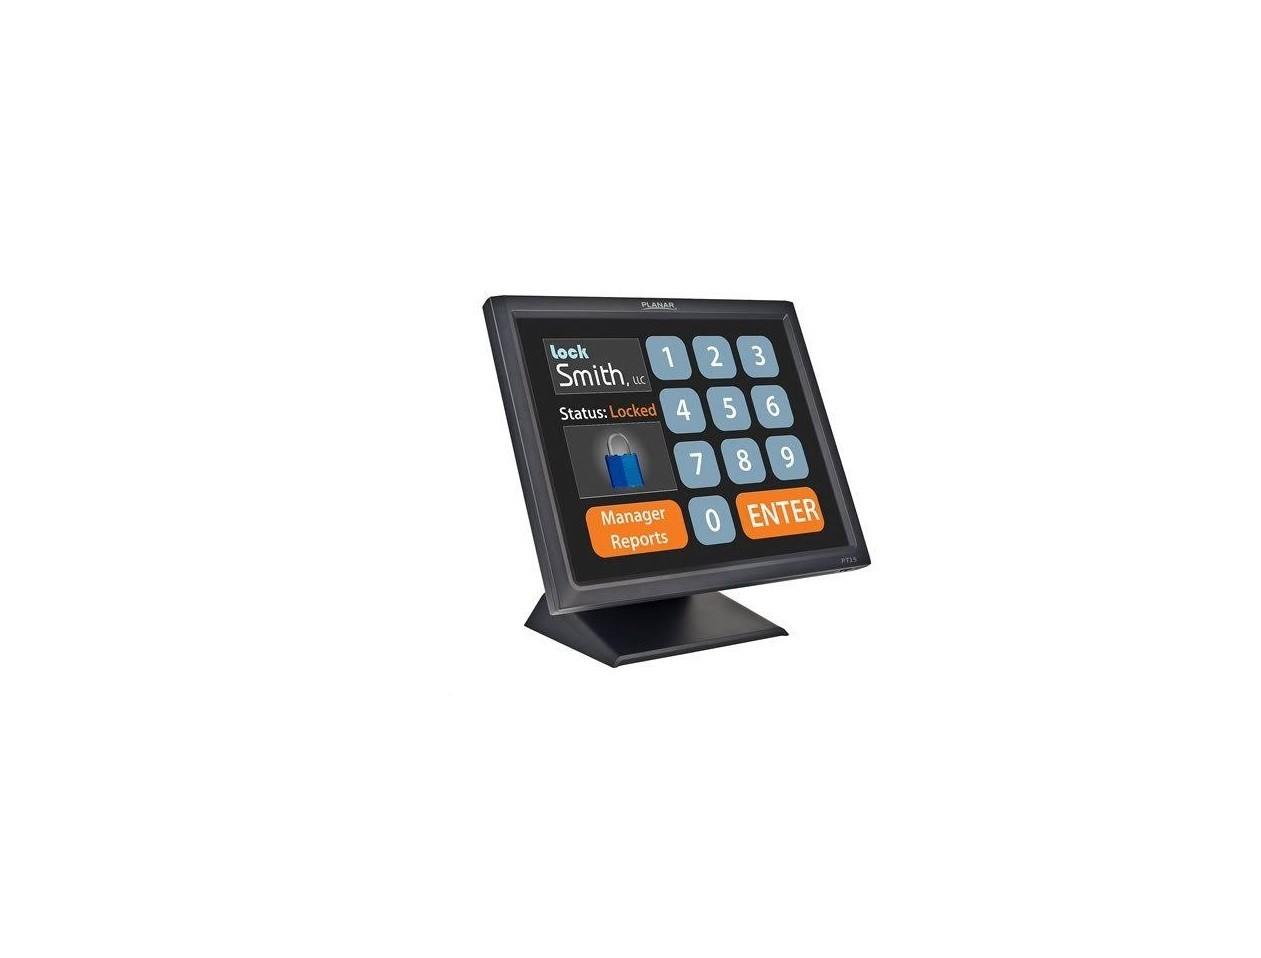 15 Planar PT1545R 1024x768 VGA Serial USB w/ Speakers LCD TouchScreen Monitor Black 997-5967-00